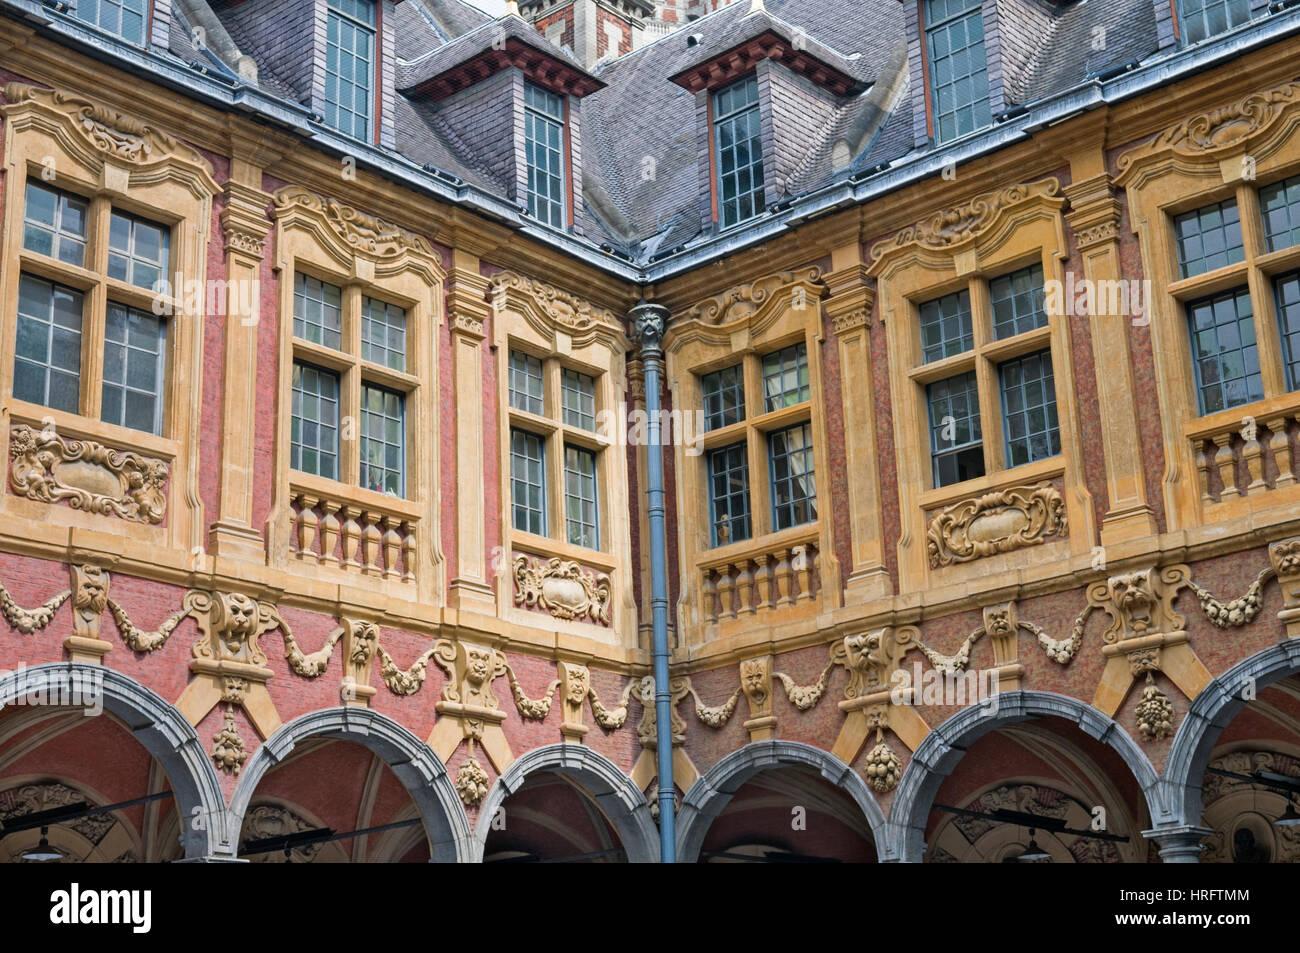 Vieille Bourse Grand Place Lille Francia Imagen De Stock